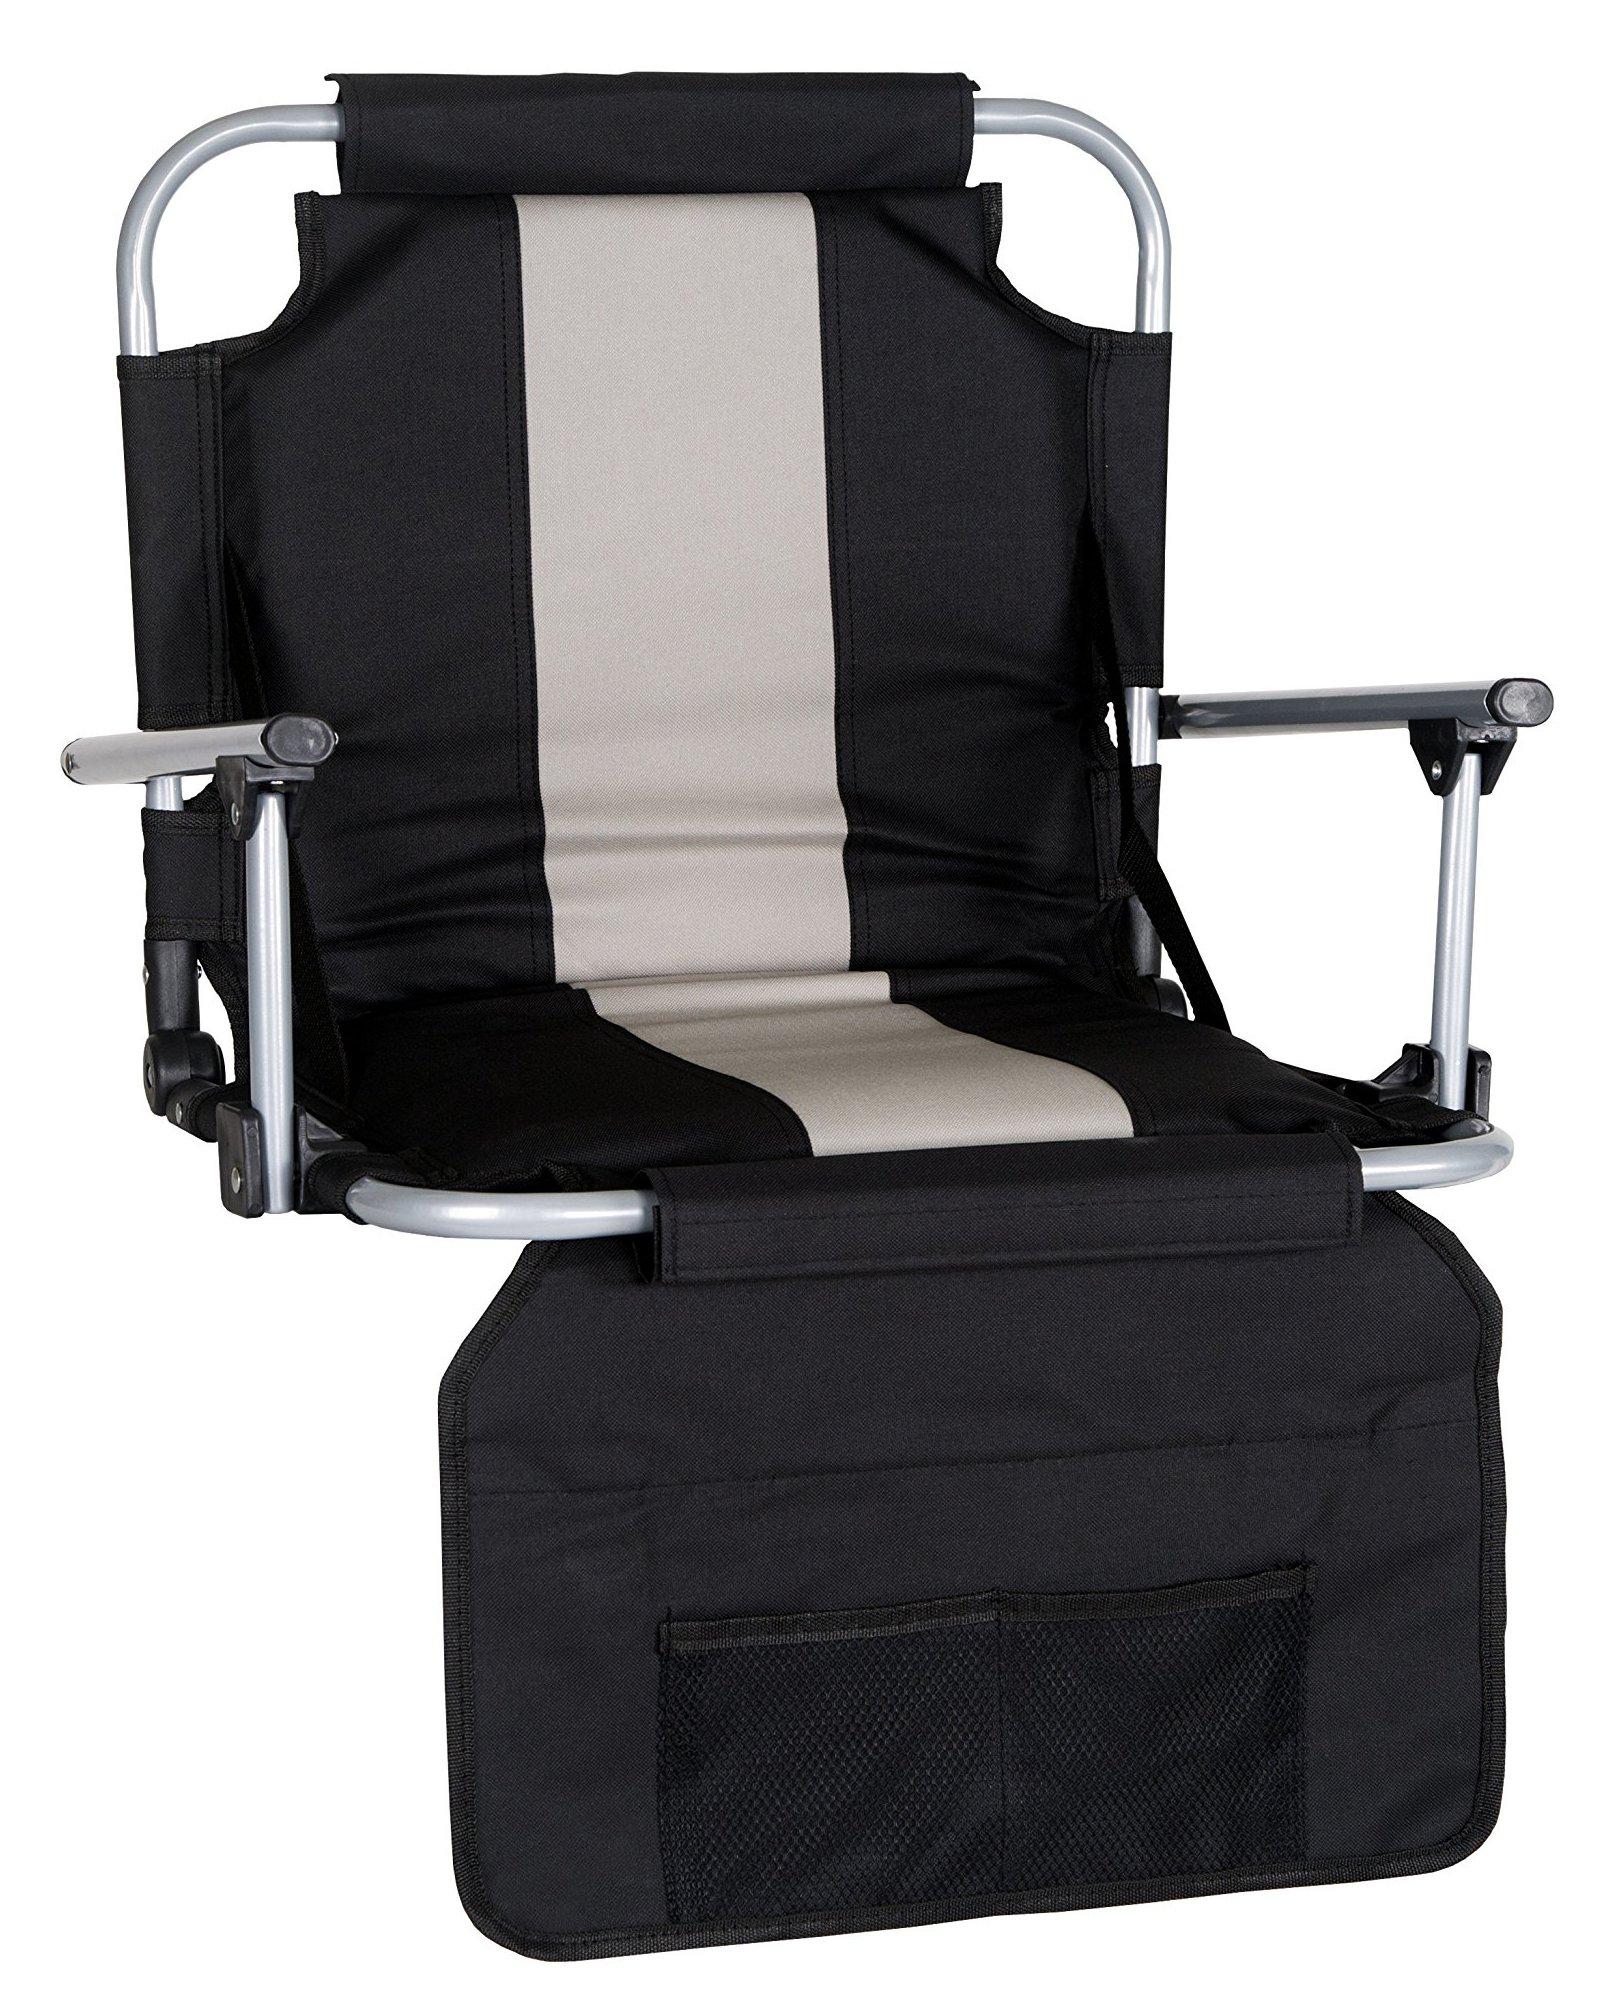 Padded Stadium Chair Portable Seat Folding Cushion